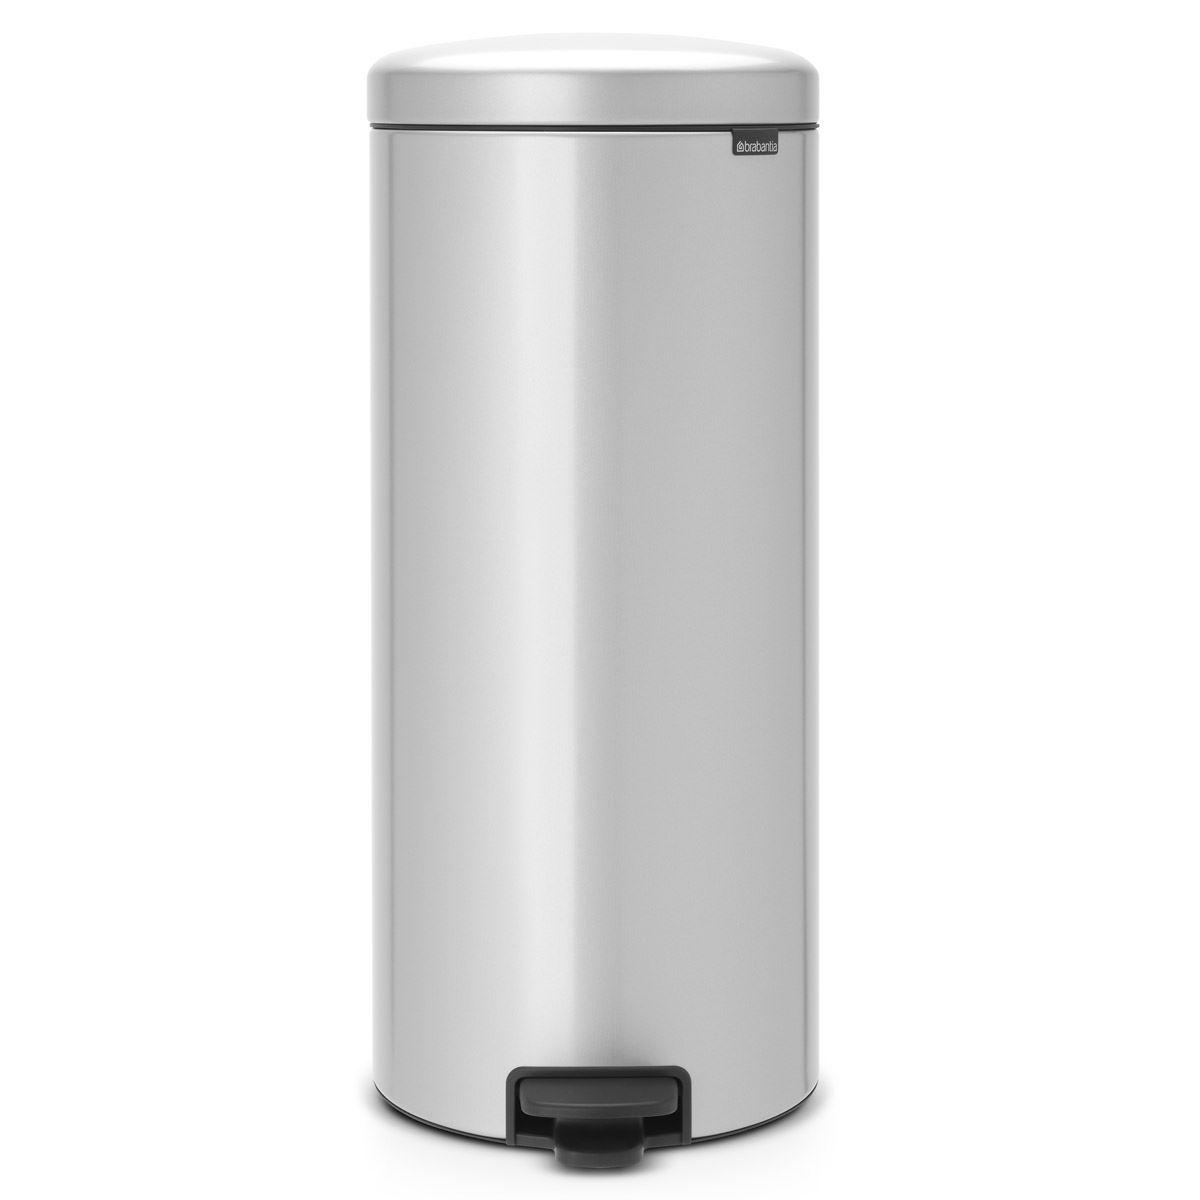 Brabantia newIcon Pedal Bin 30 Litre Plastic Bucket Metallic Grey